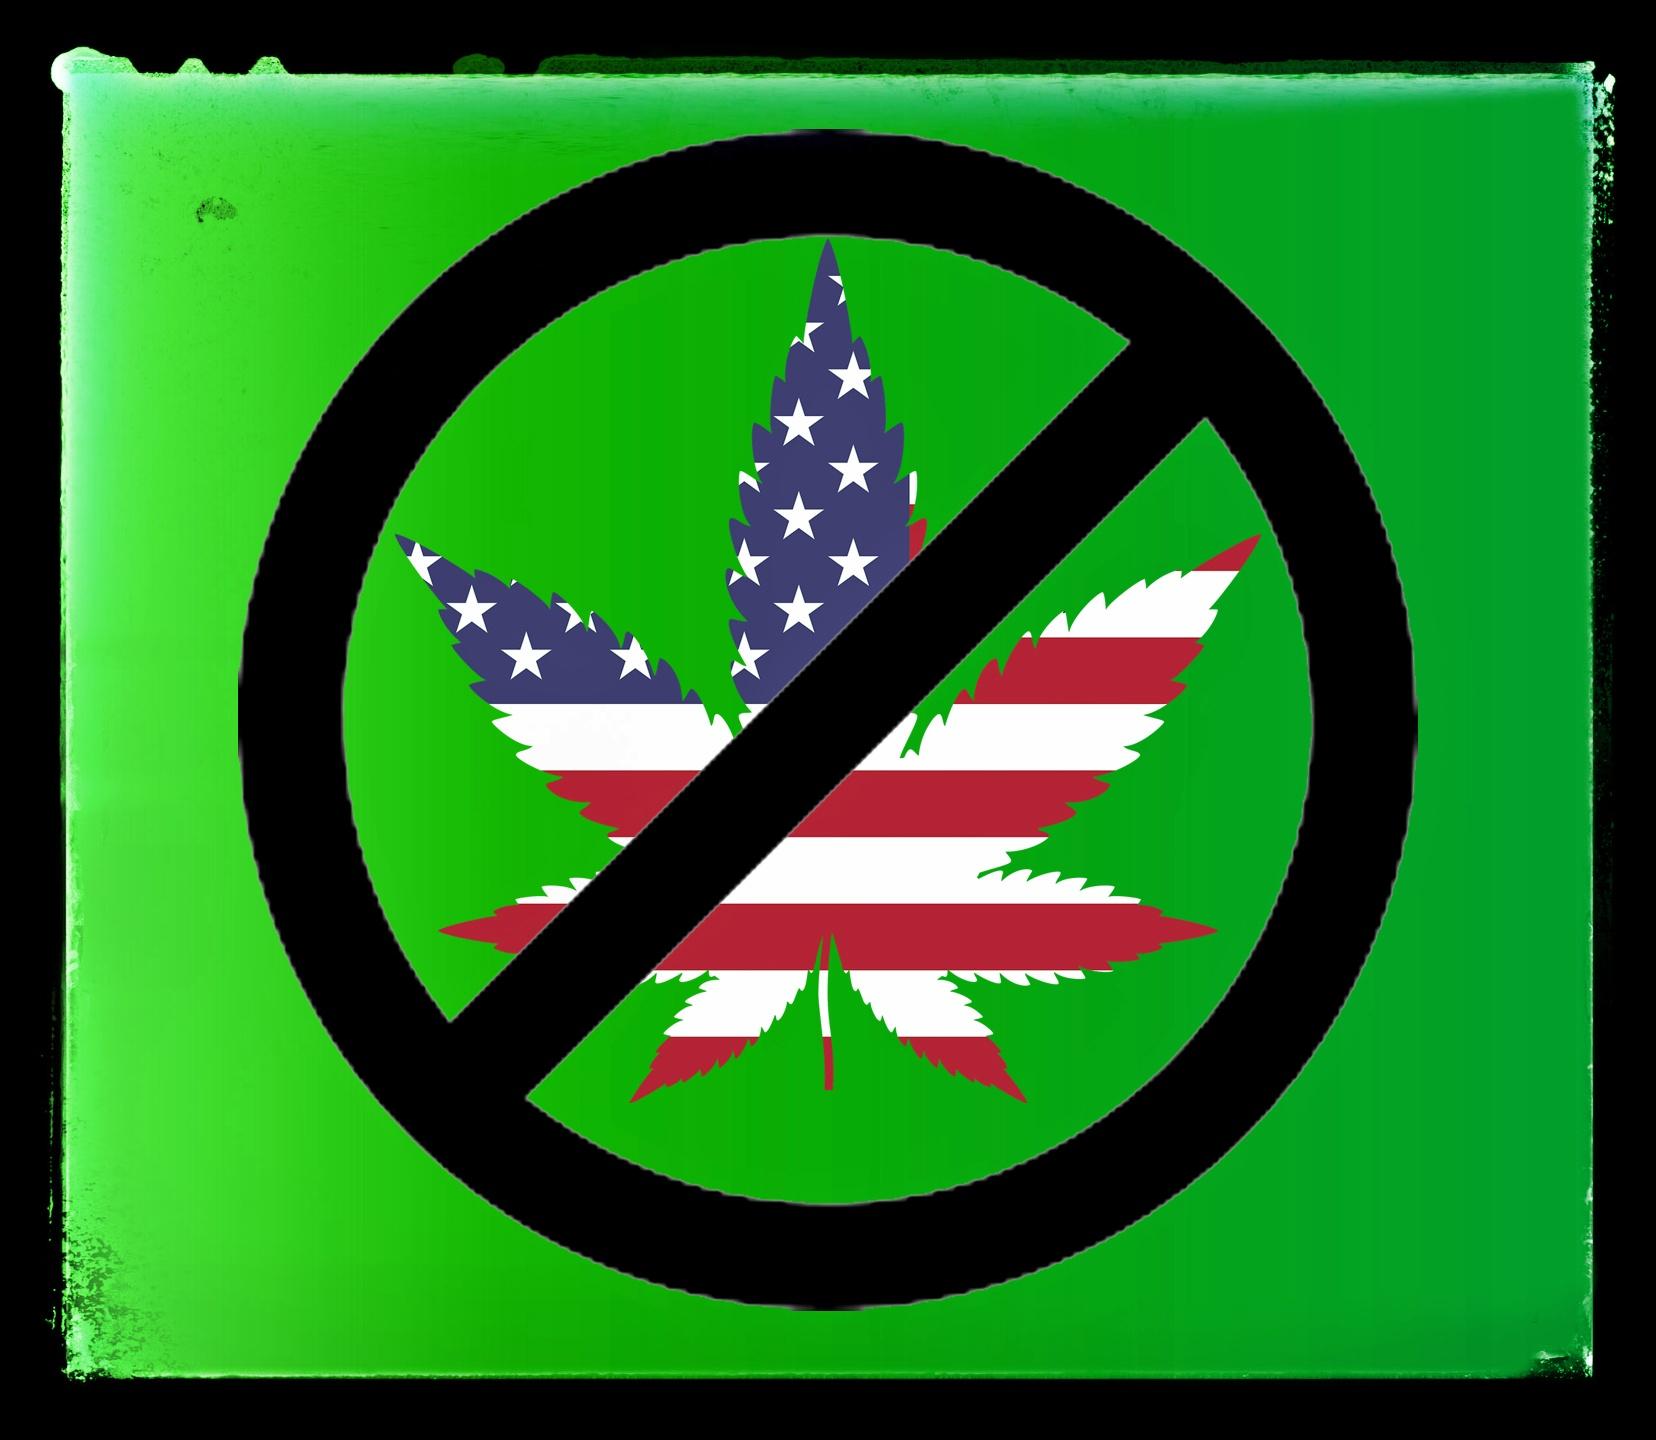 schwantes-no-marijuana-allowed-in-usa